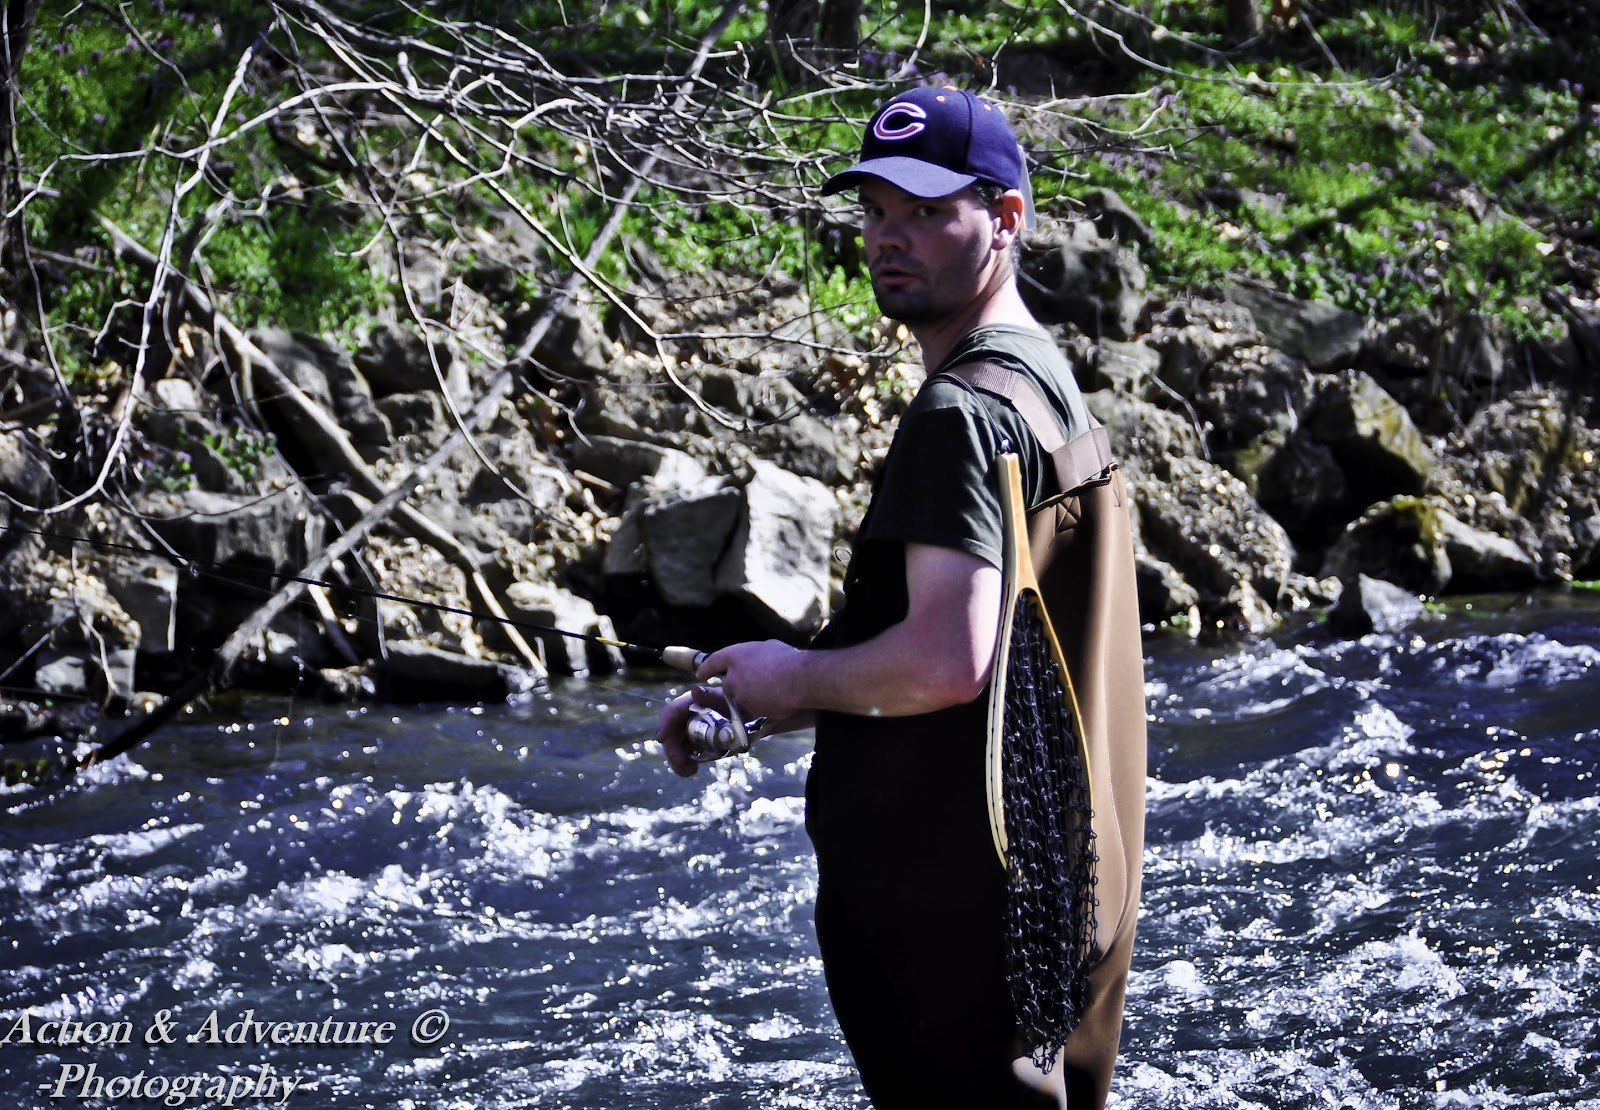 Bait shop photog trout fishing bennett springs missiouri for Bennett springs trout fishing